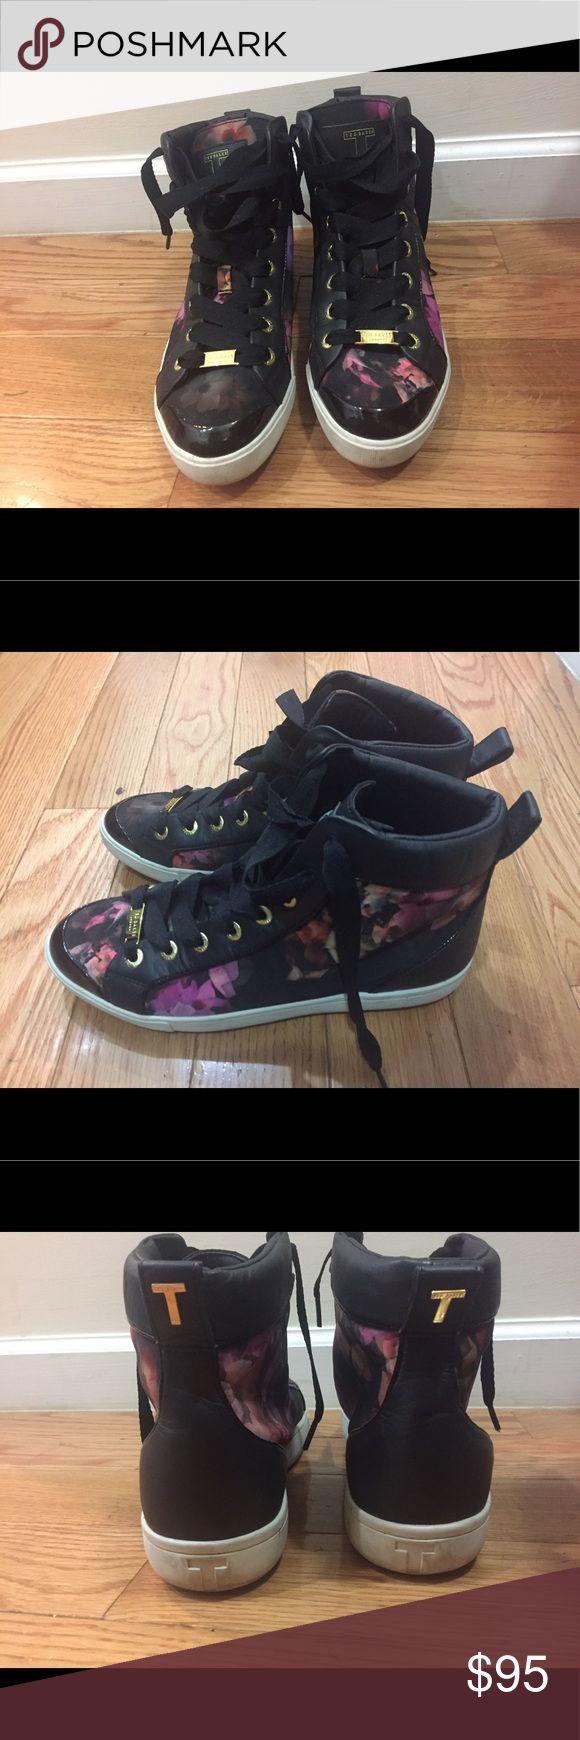 Ted Baker Floral Hightop Sneakers, 9 Ten baker floral hightop sneakers size 9 that are barely worn with little signs of wear. Ted Baker Shoes Sneakers